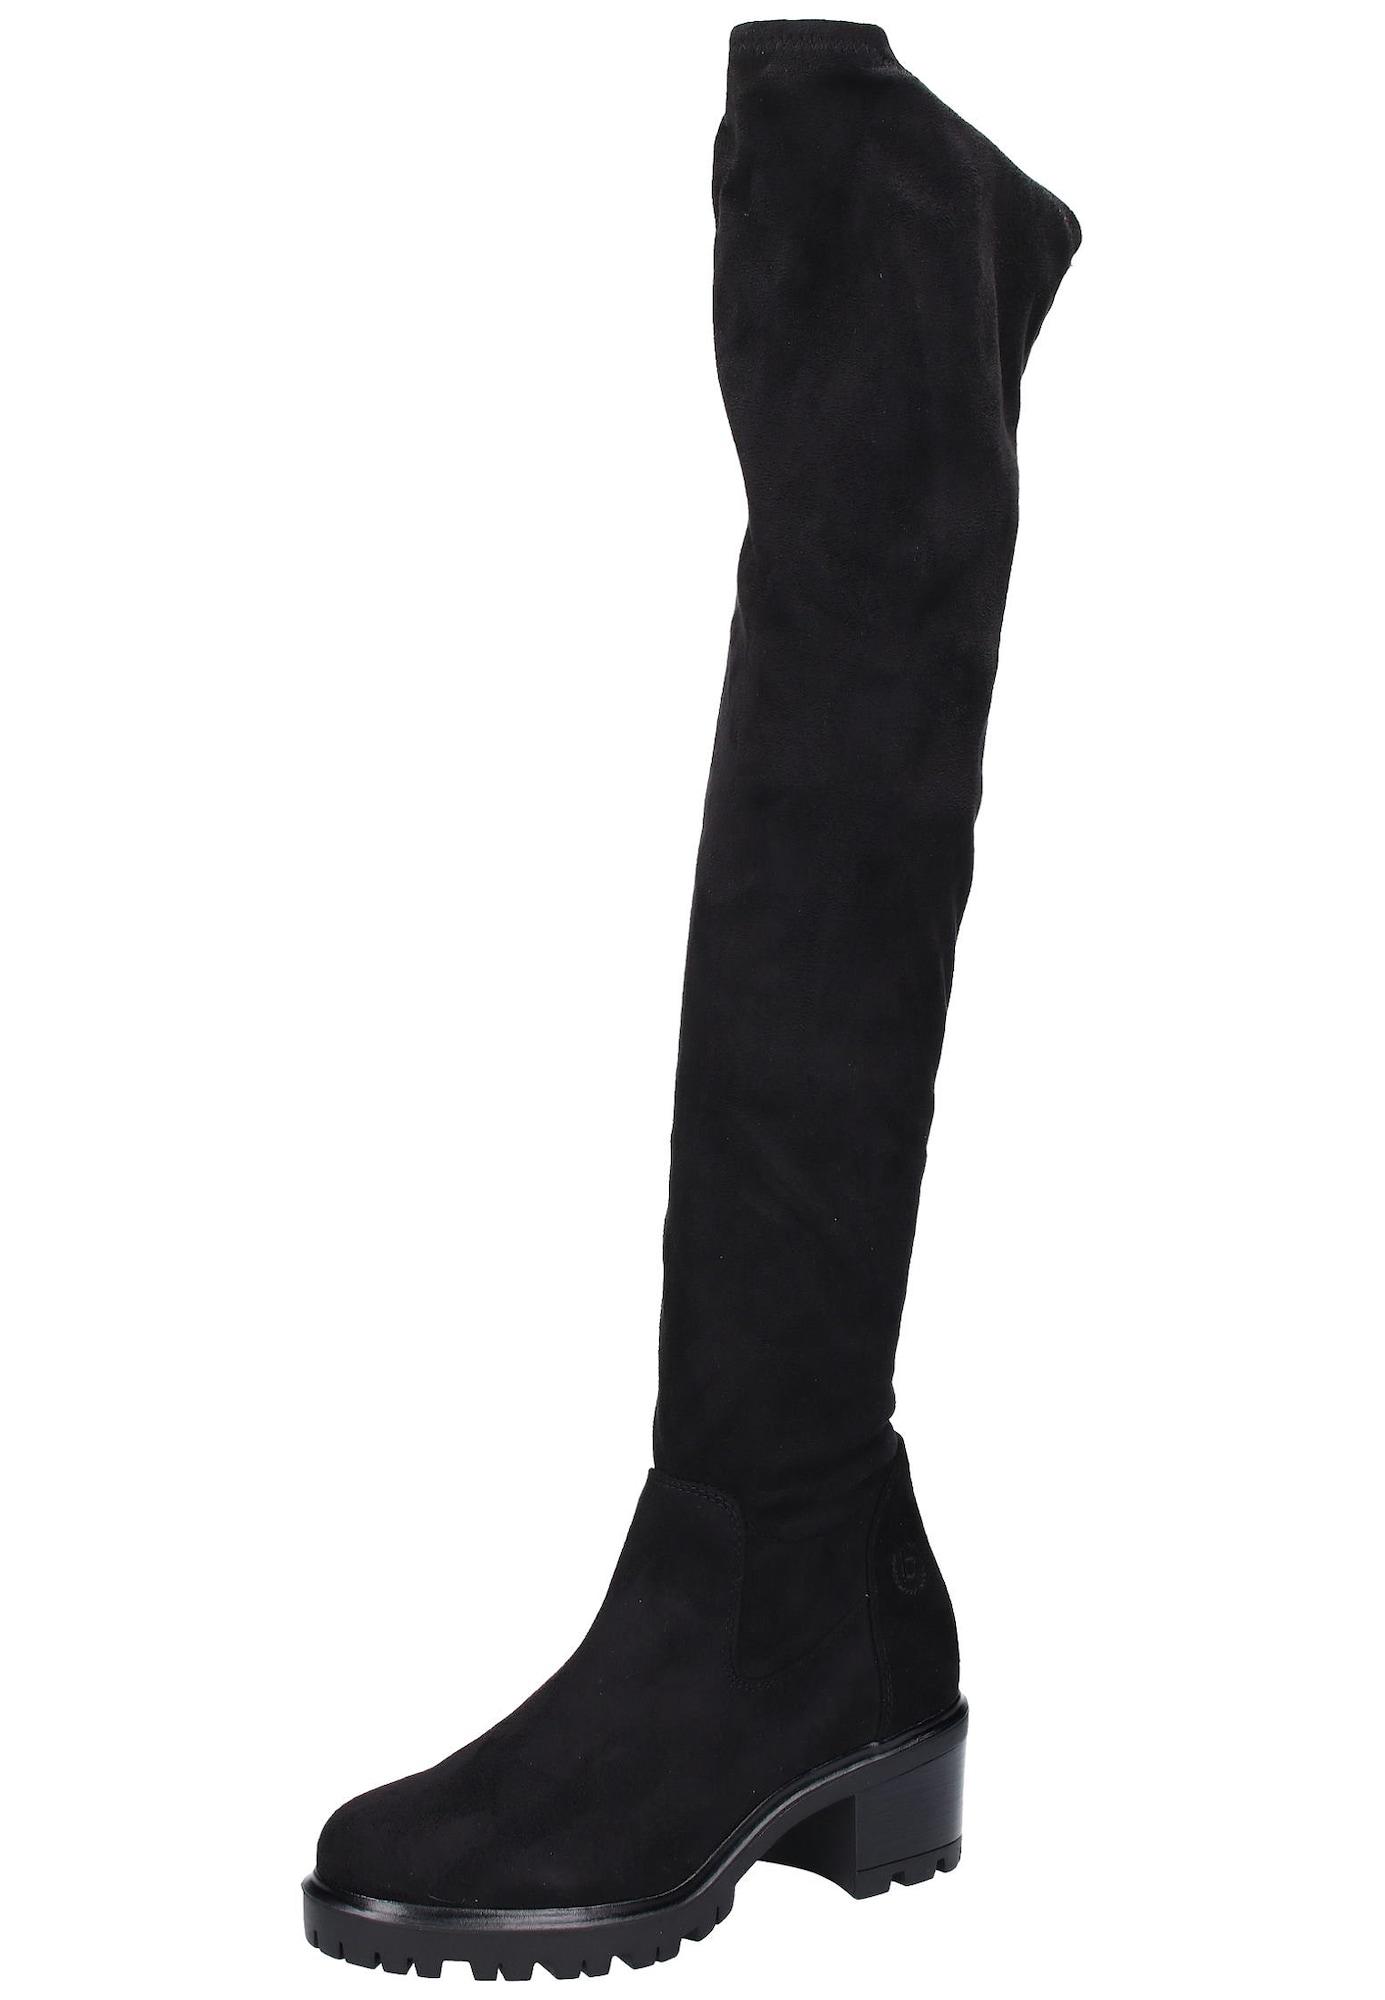 Bugatti, Dames Overknee laarzen 'Clea', zwart